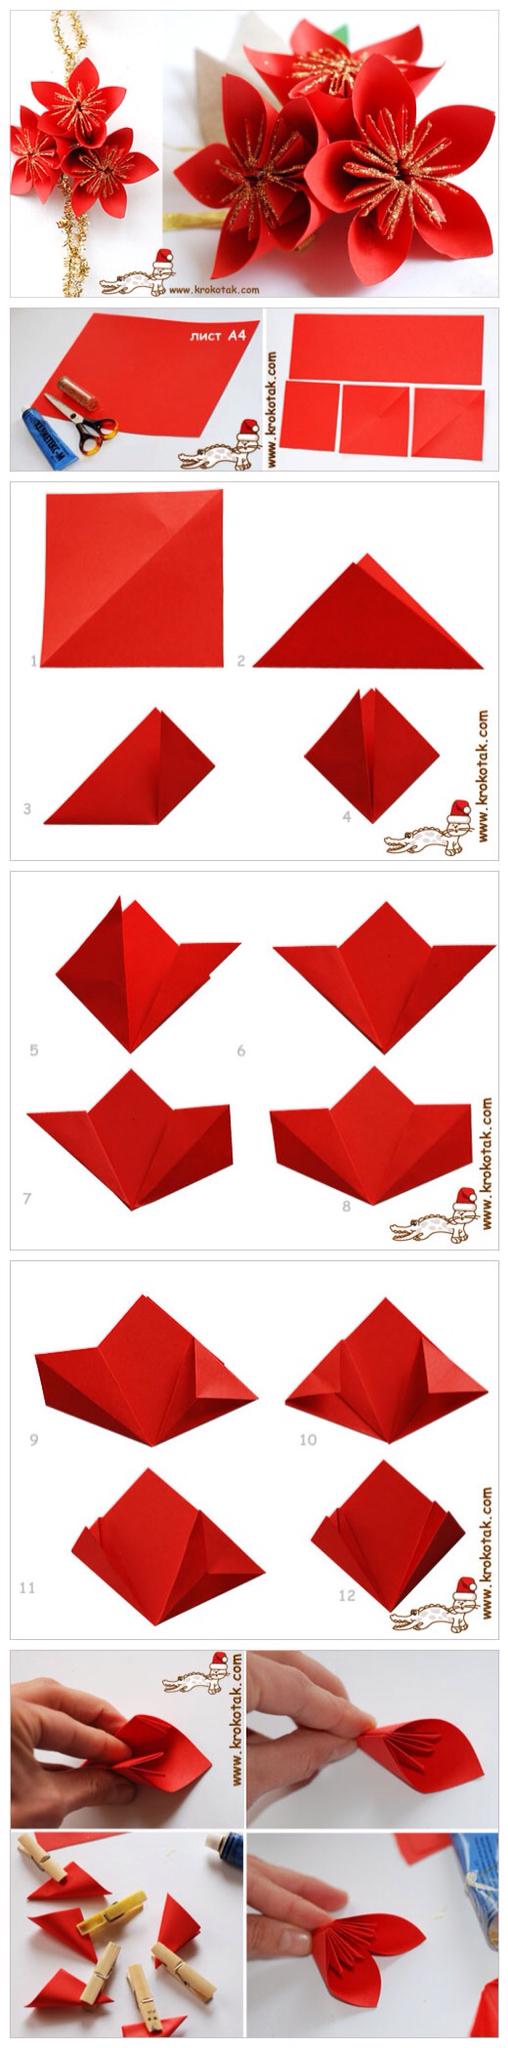 Origami Diy Pinterest Origami Paper Snowflakes And Diy Paper